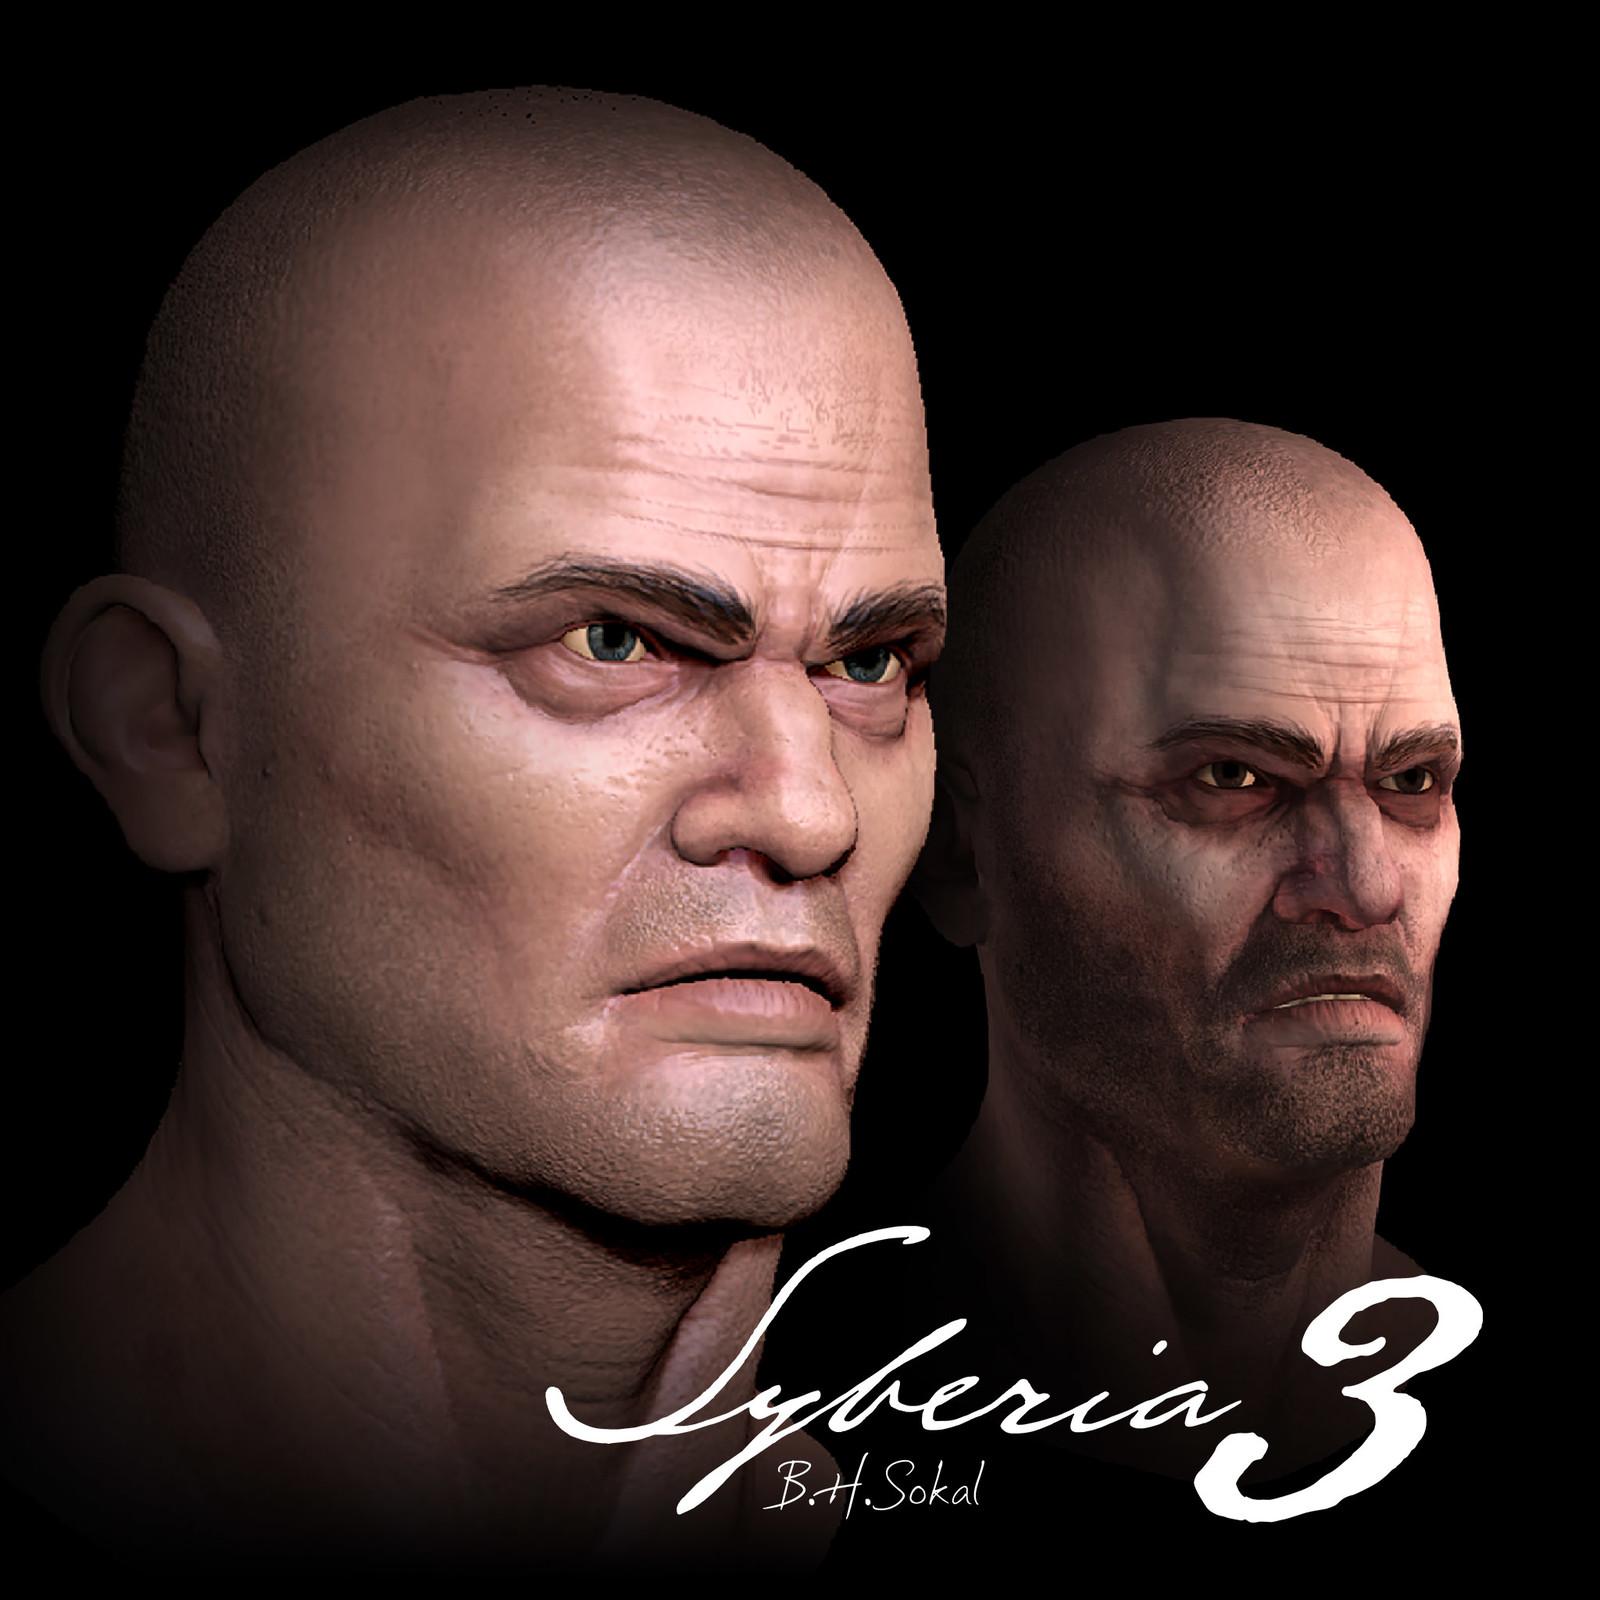 Syberia 3: Soldier